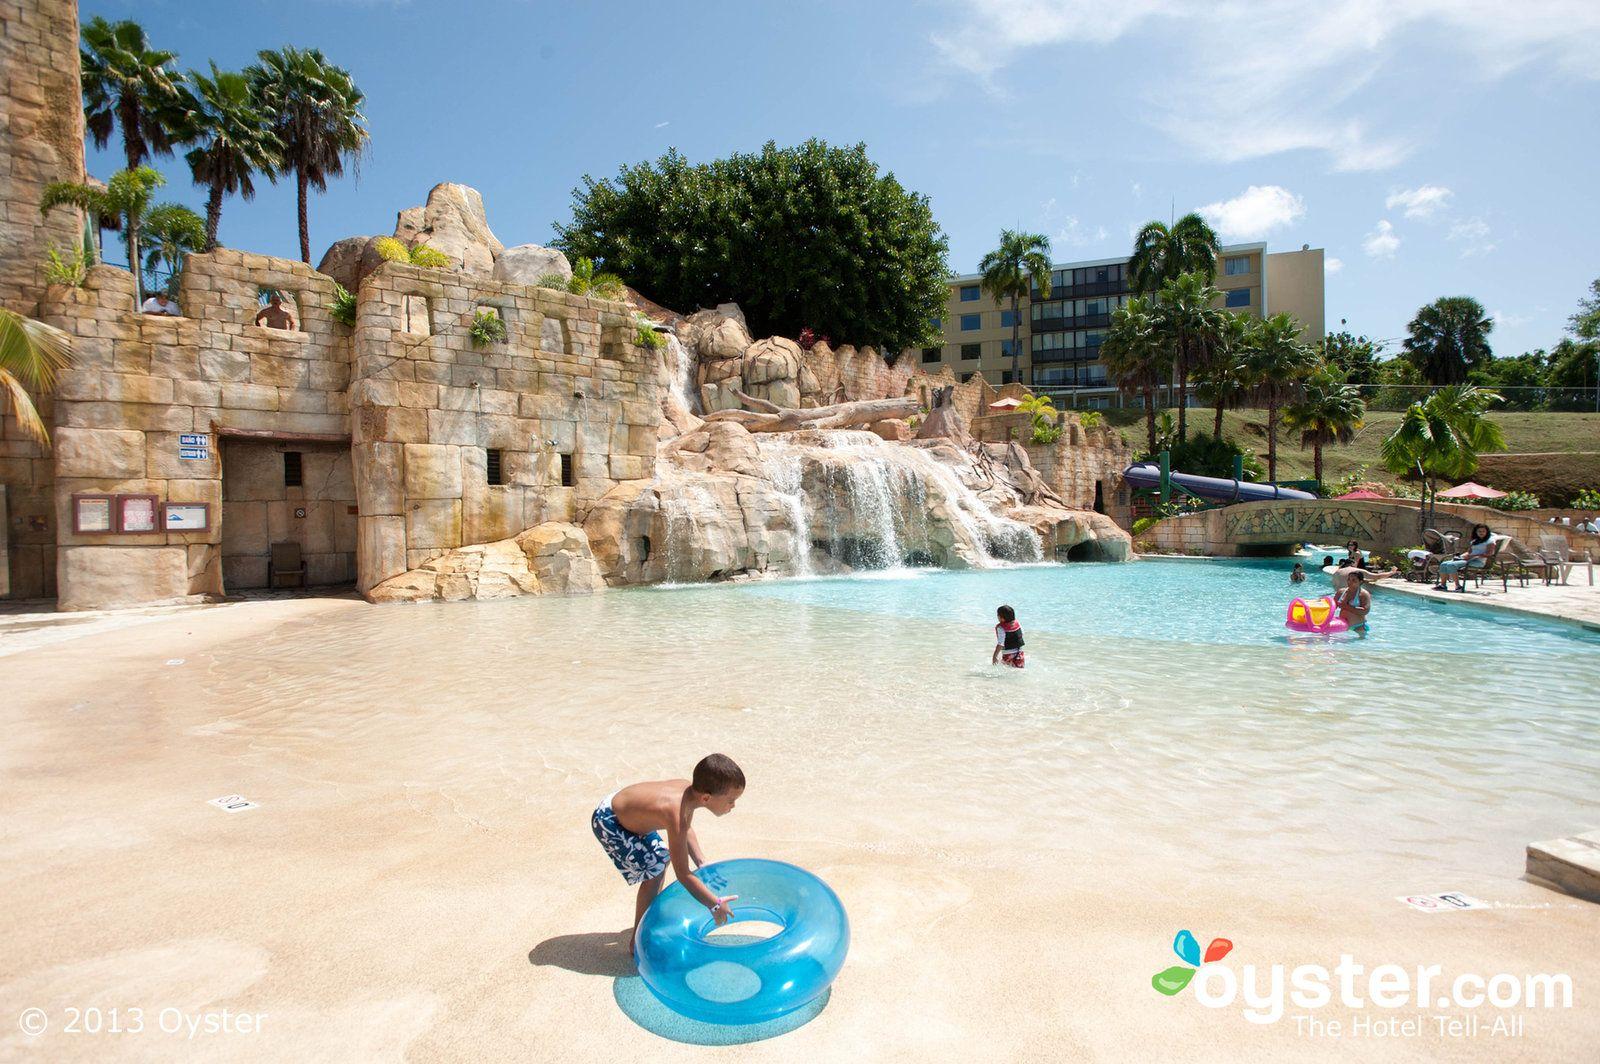 Puerto rico vacations pool at the mayaguez resort for Puerto rico vacation ideas